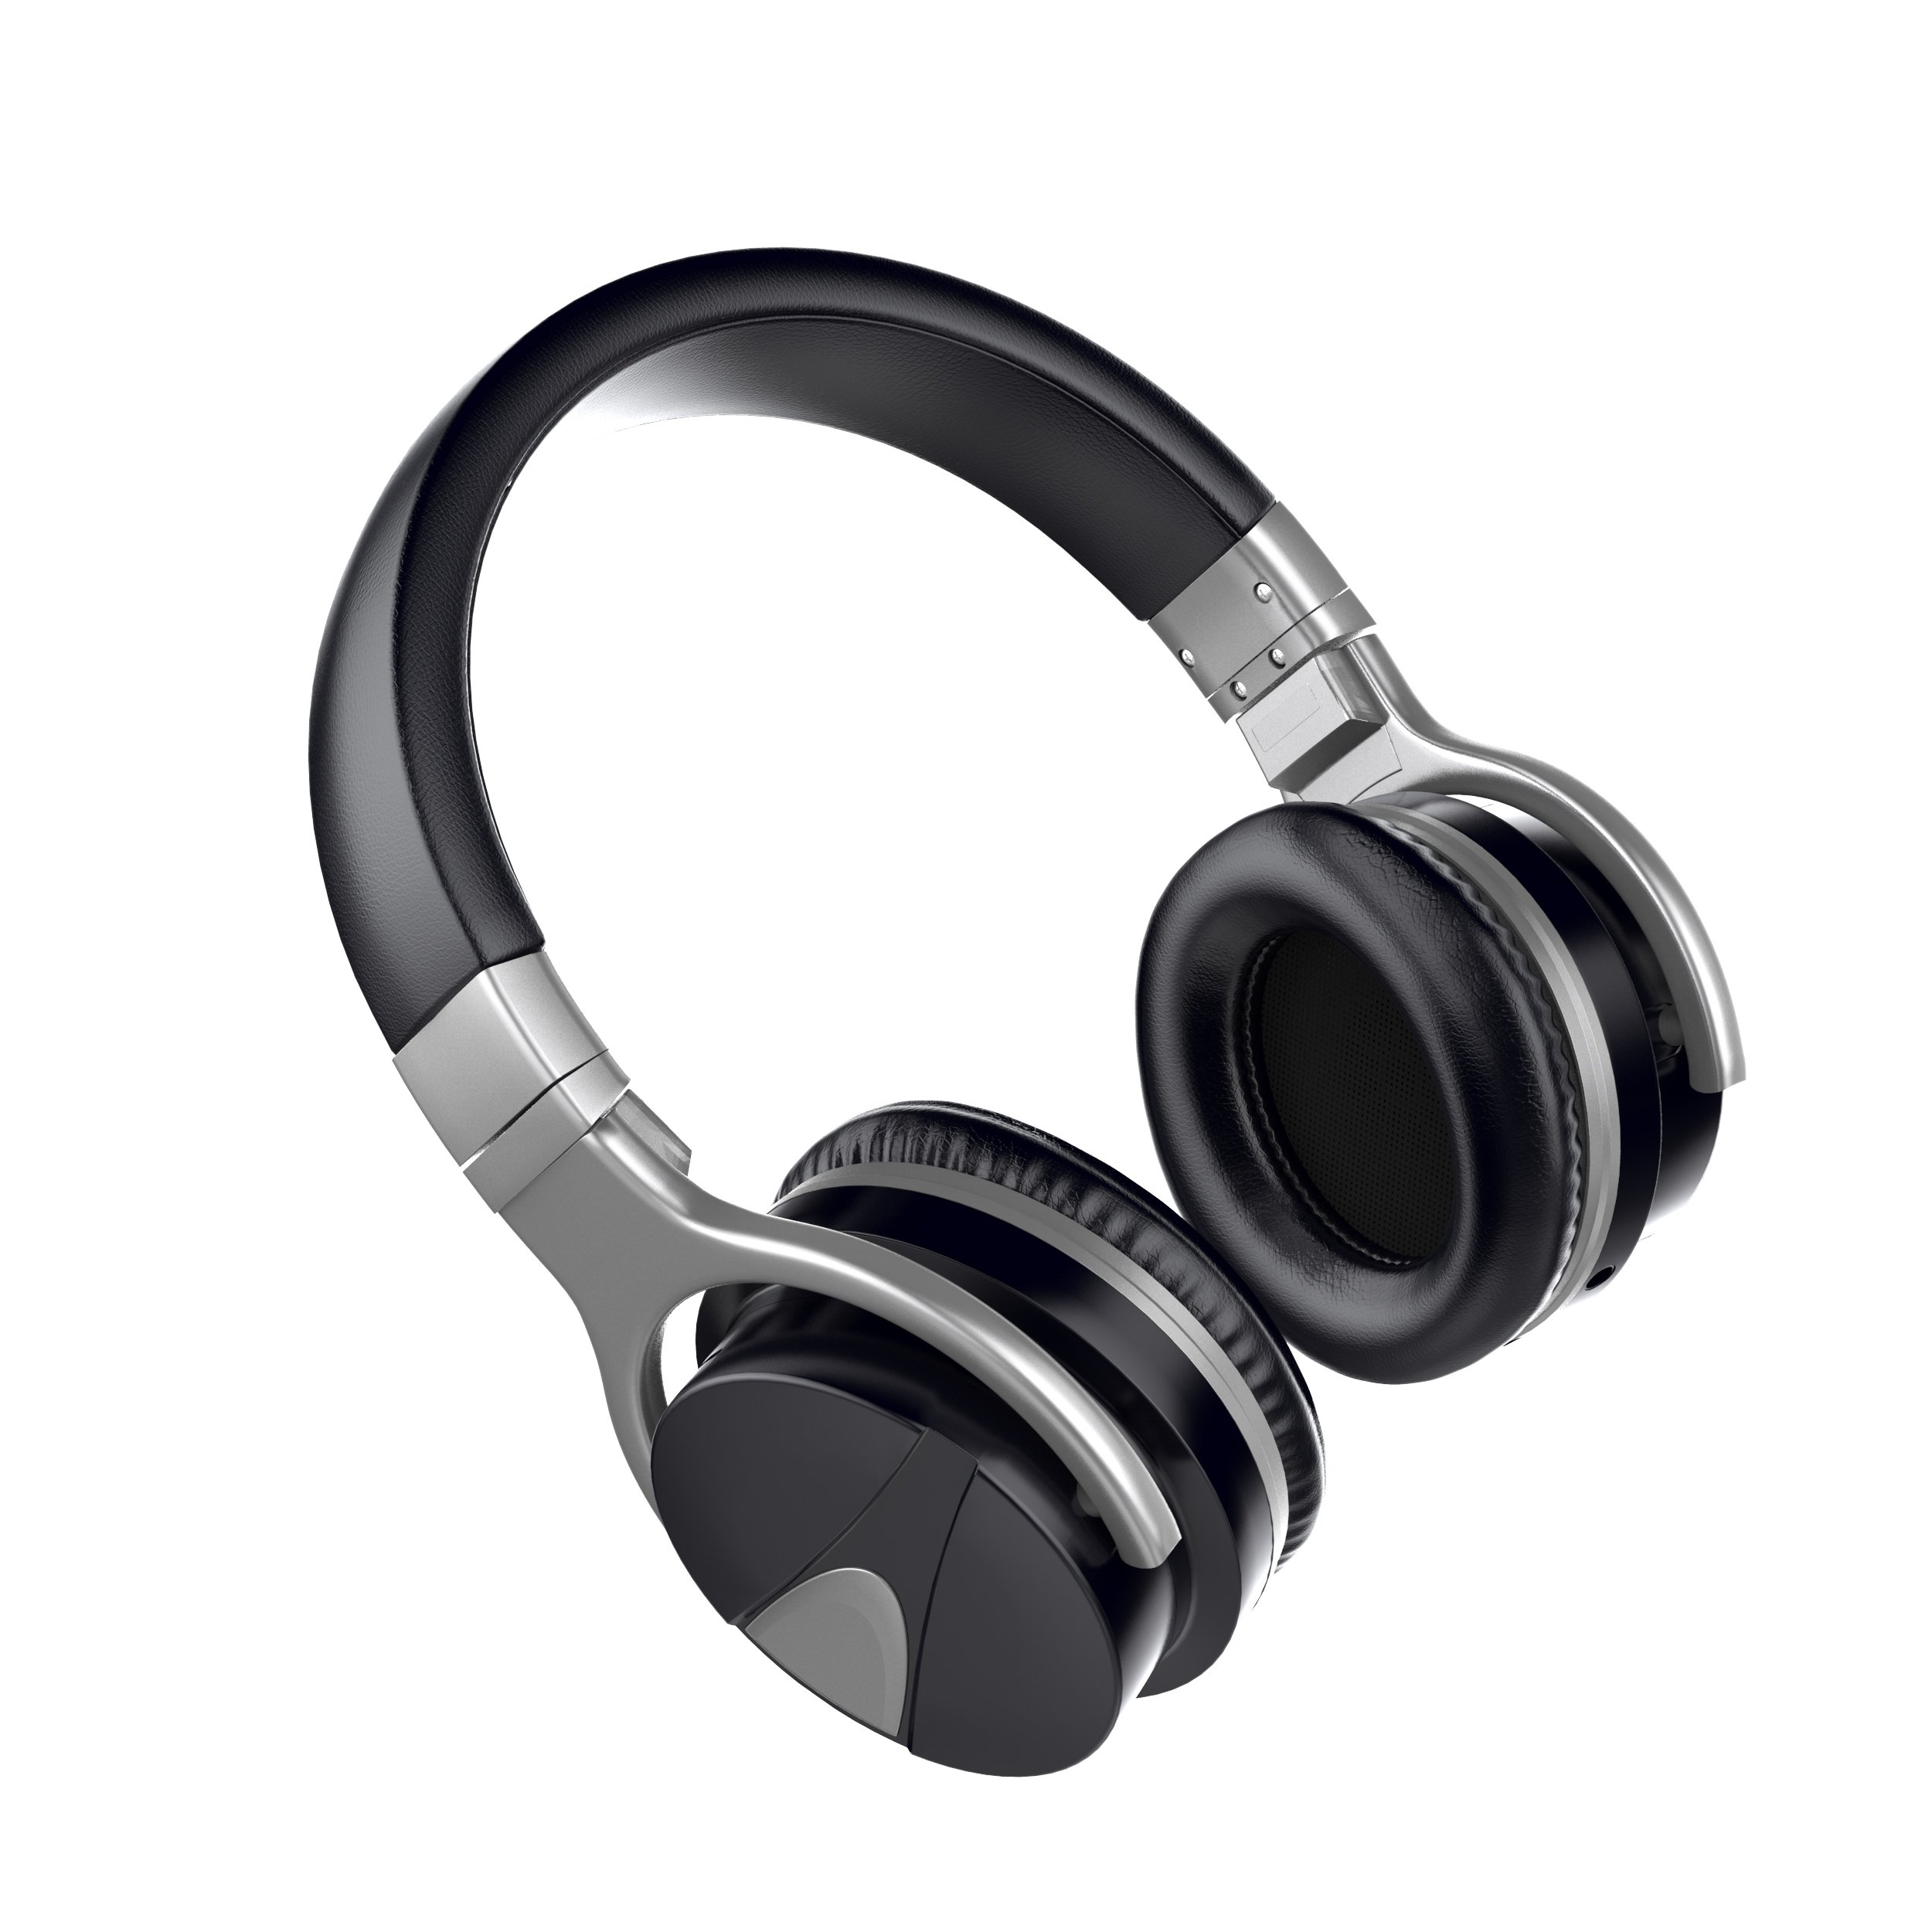 USTEK Wireless Headphones, Active Noise Cancelling Headphones Bluetooth Headphones with Mic Deep Bass Wireless Headphones,Over Ear Bluetooth Stereo Headphones with Microphone Adjustable Earphones ANC